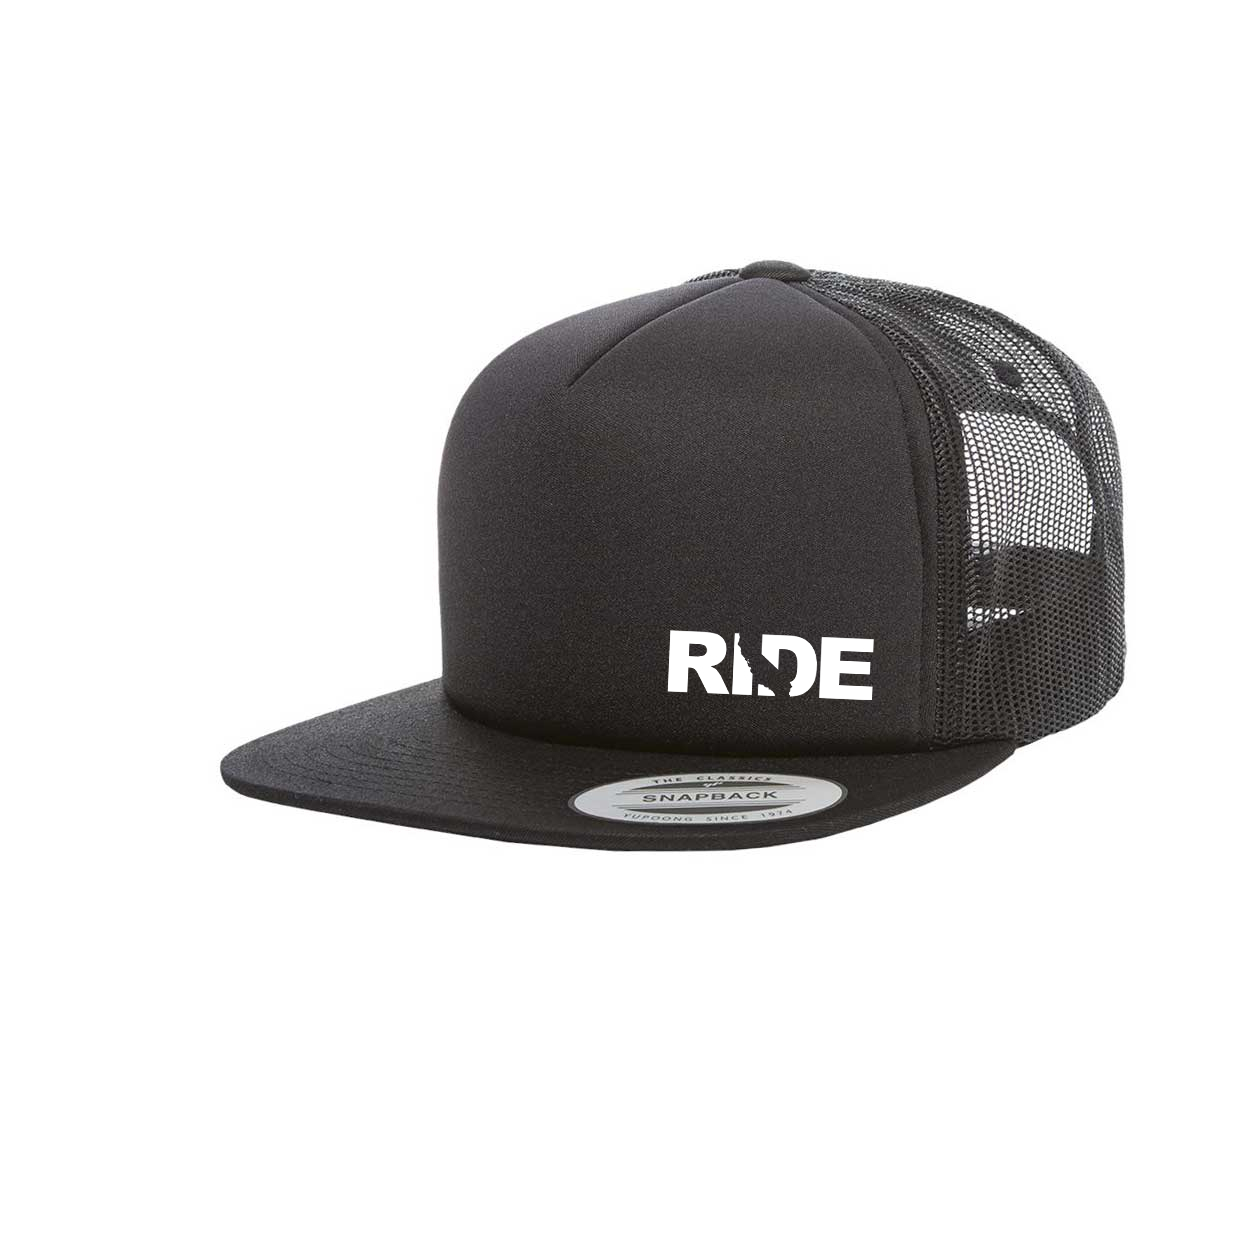 Ride California Night Out Premium Foam Flat Brim Snapback Hat Black (White Logo)